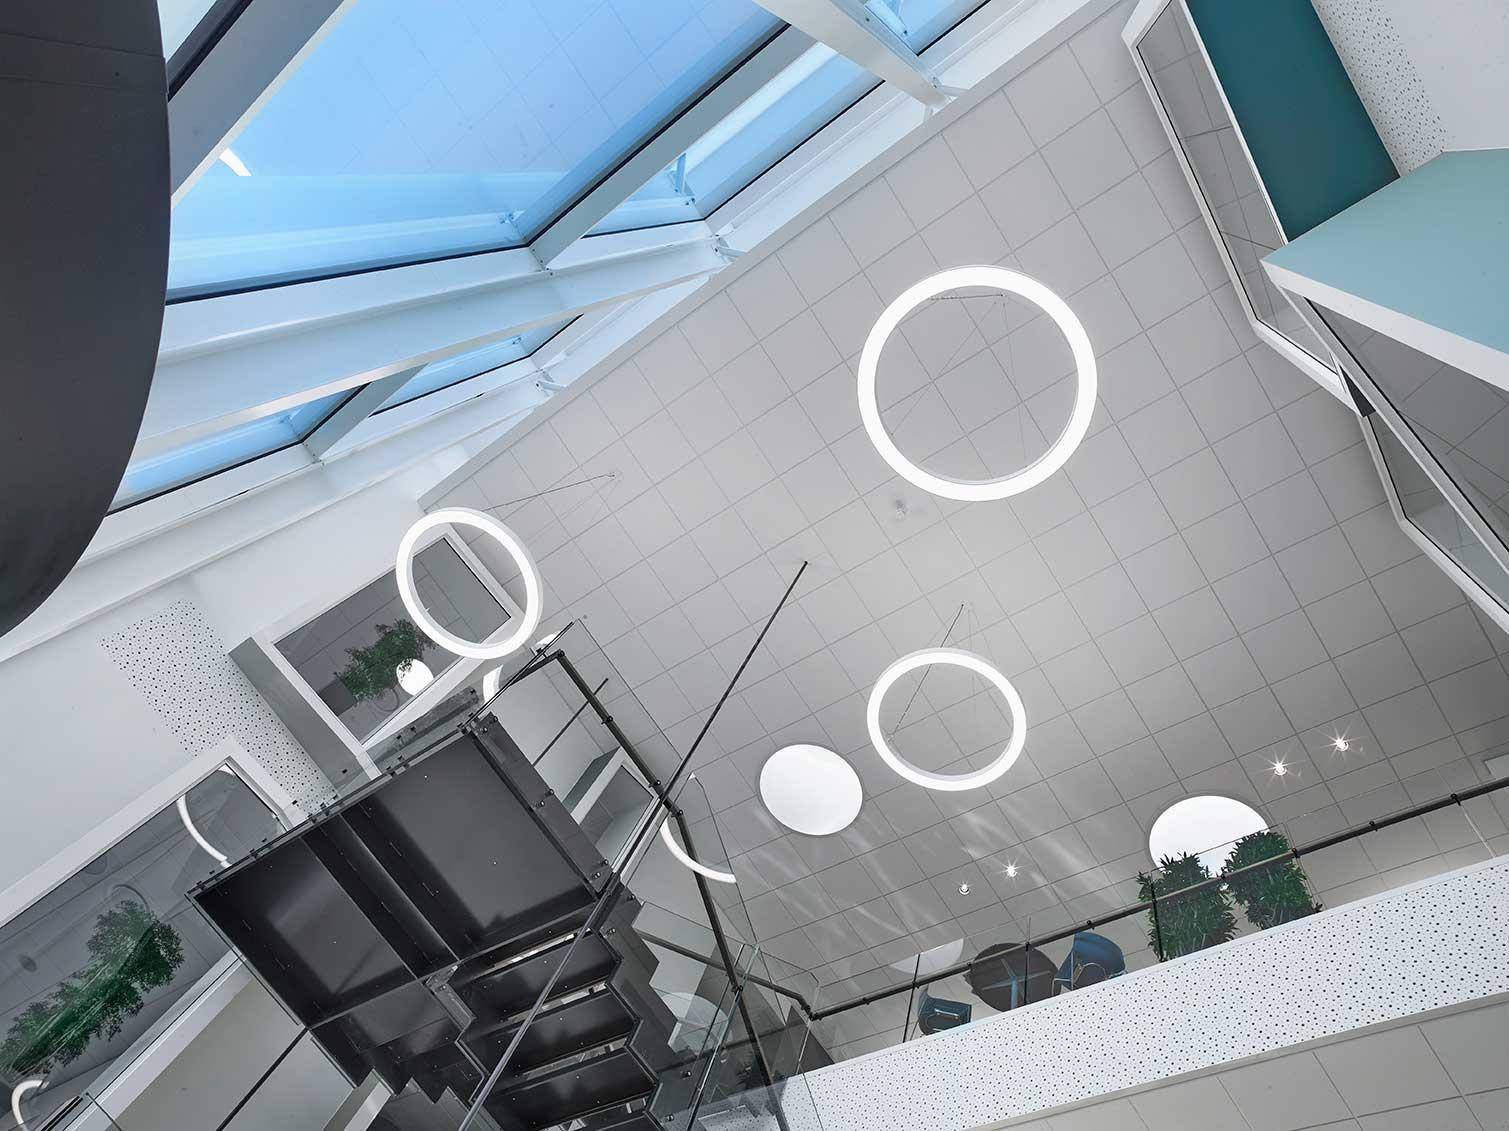 Ringo Star 100mm G1/P1 cirkulær pendel lampe nedhængt fra loft i storrum/foyer - Luminex